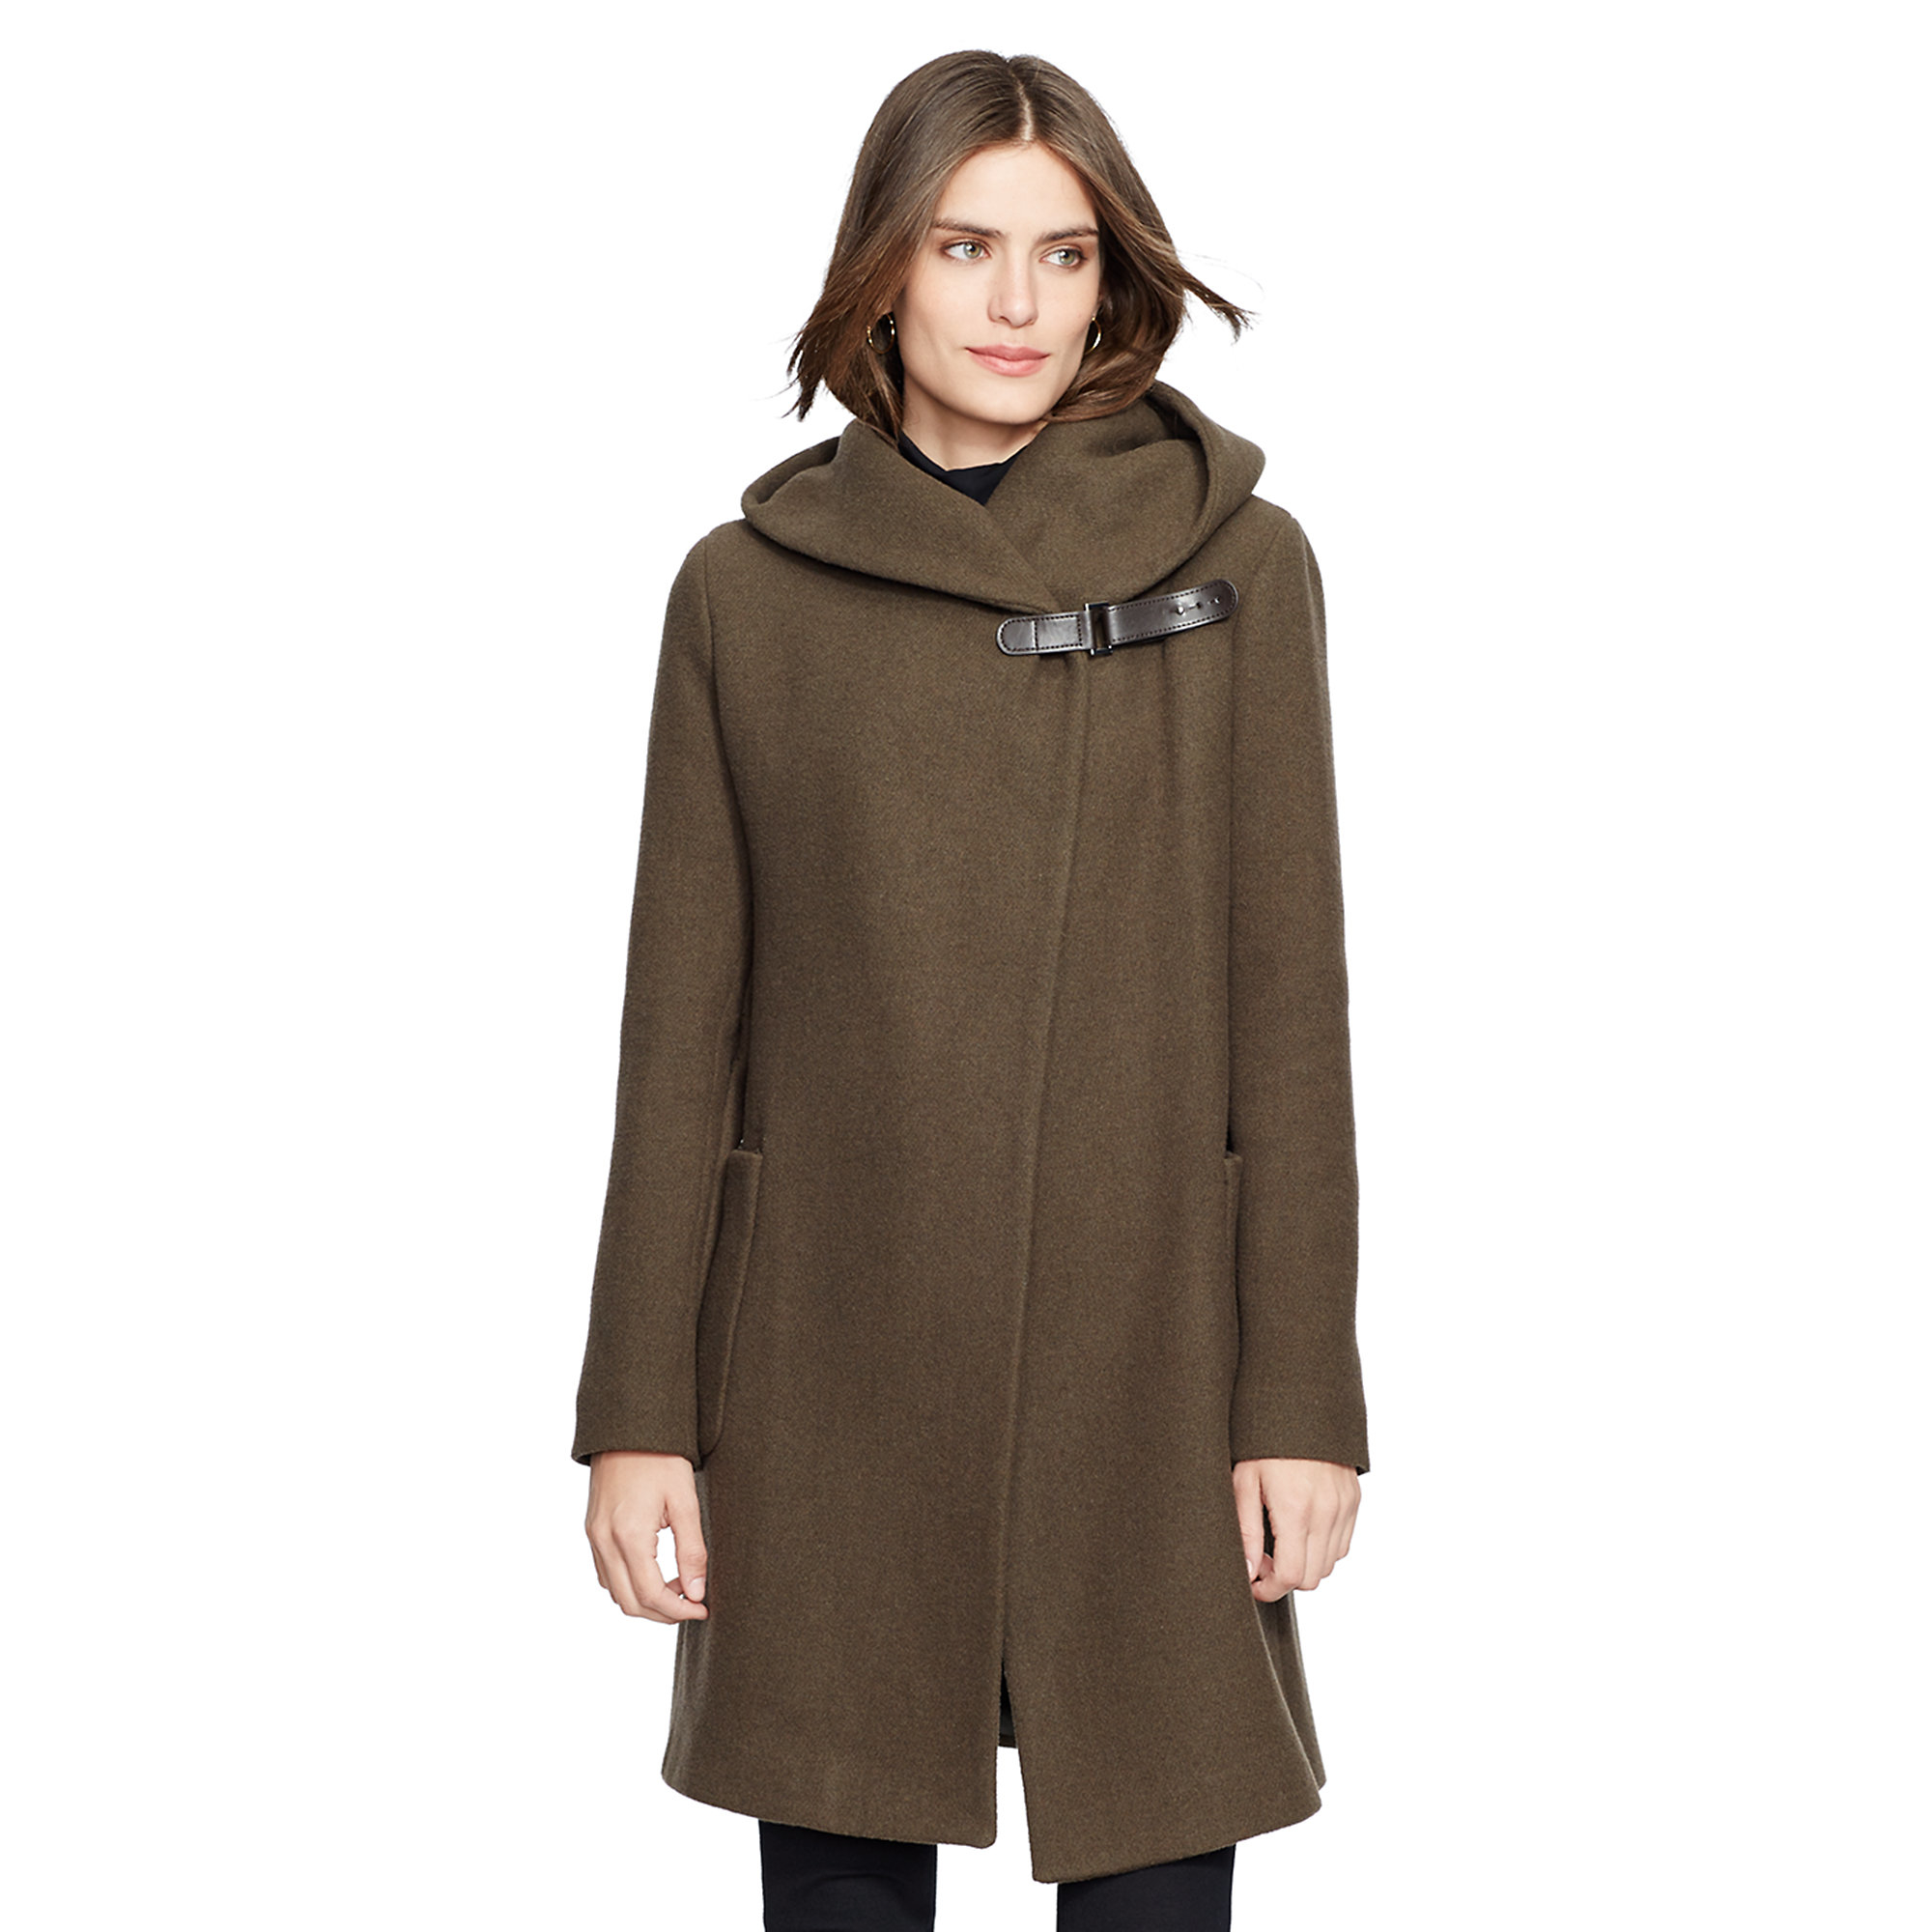 Ralph lauren Wool-blend Hooded Coat in Brown | Lyst